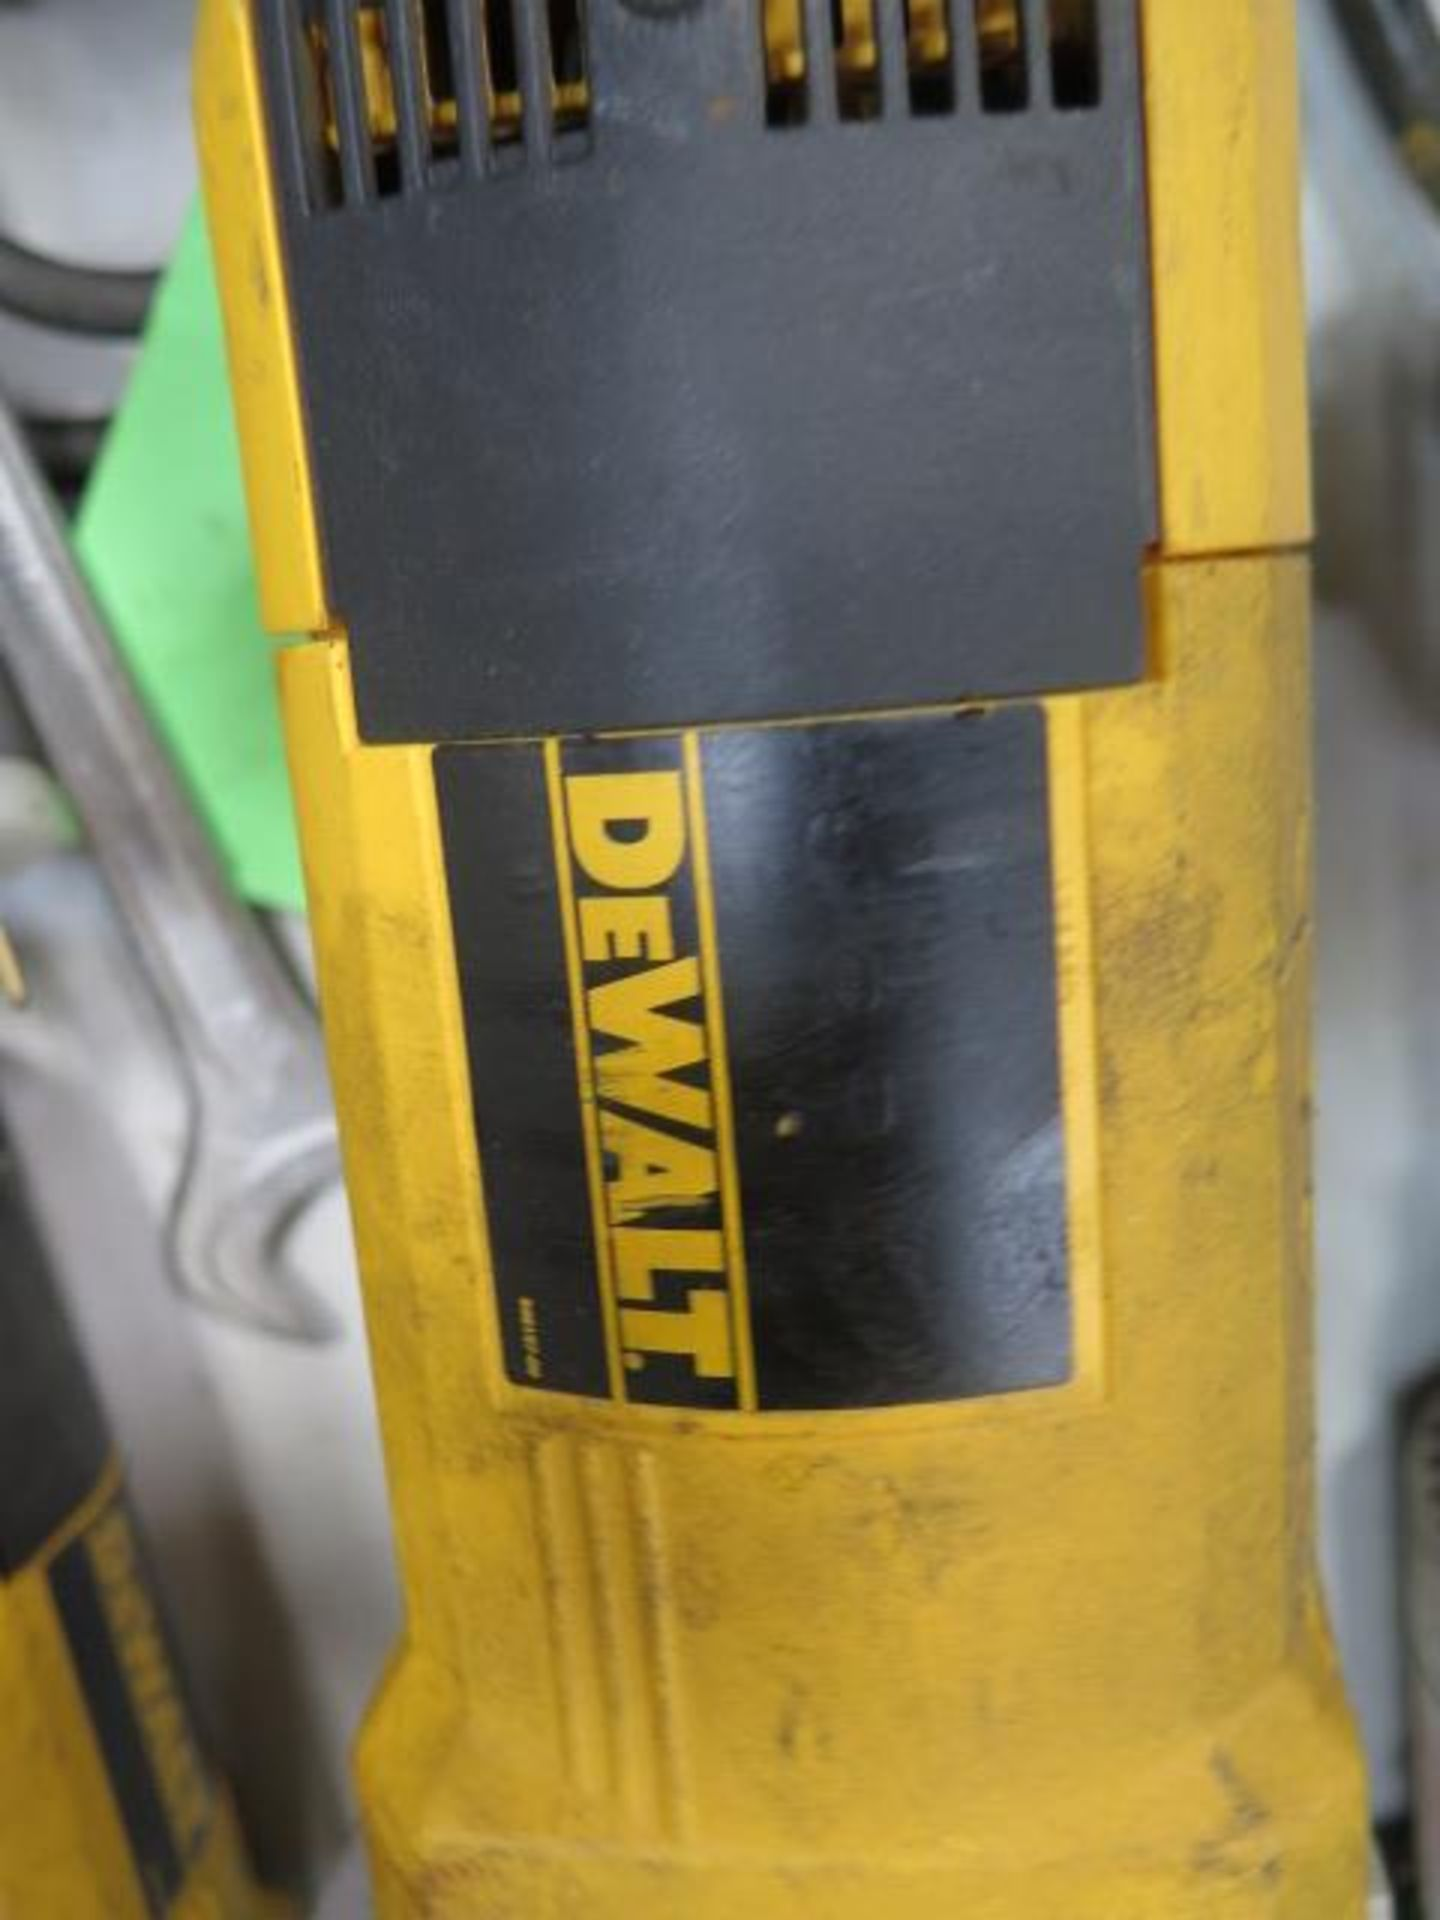 DeWalt Straight Shaft Grinders (2) (SOLD AS-IS - NO WARRANTY) - Image 5 of 5